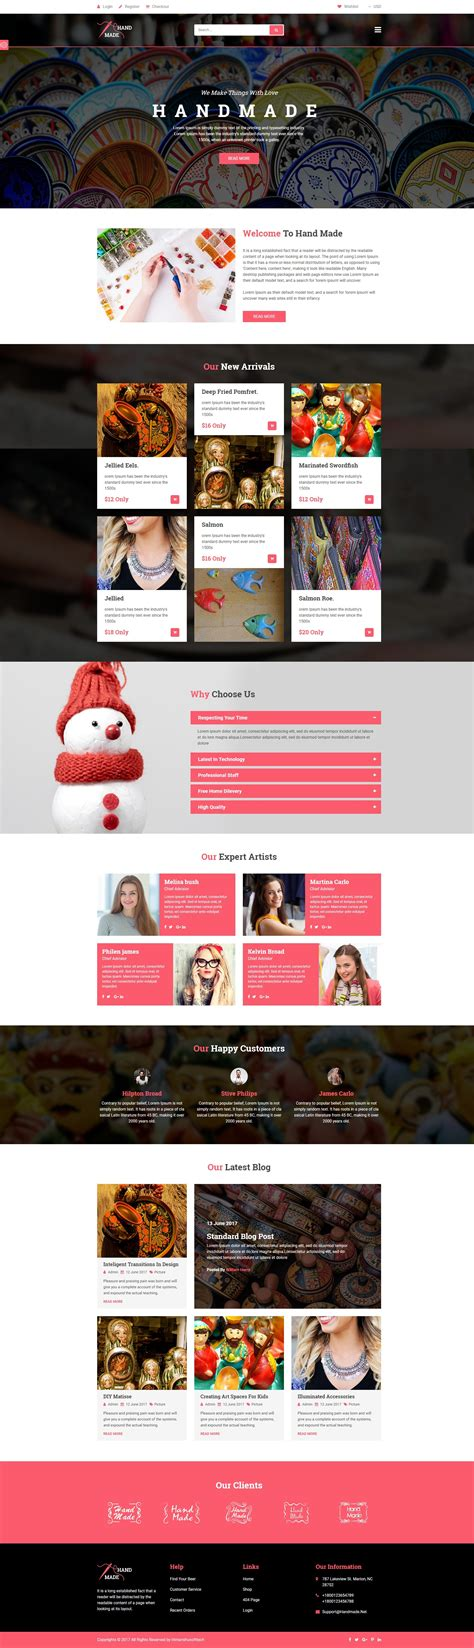 templates for handicrafts website handicraft handmade product shop template by